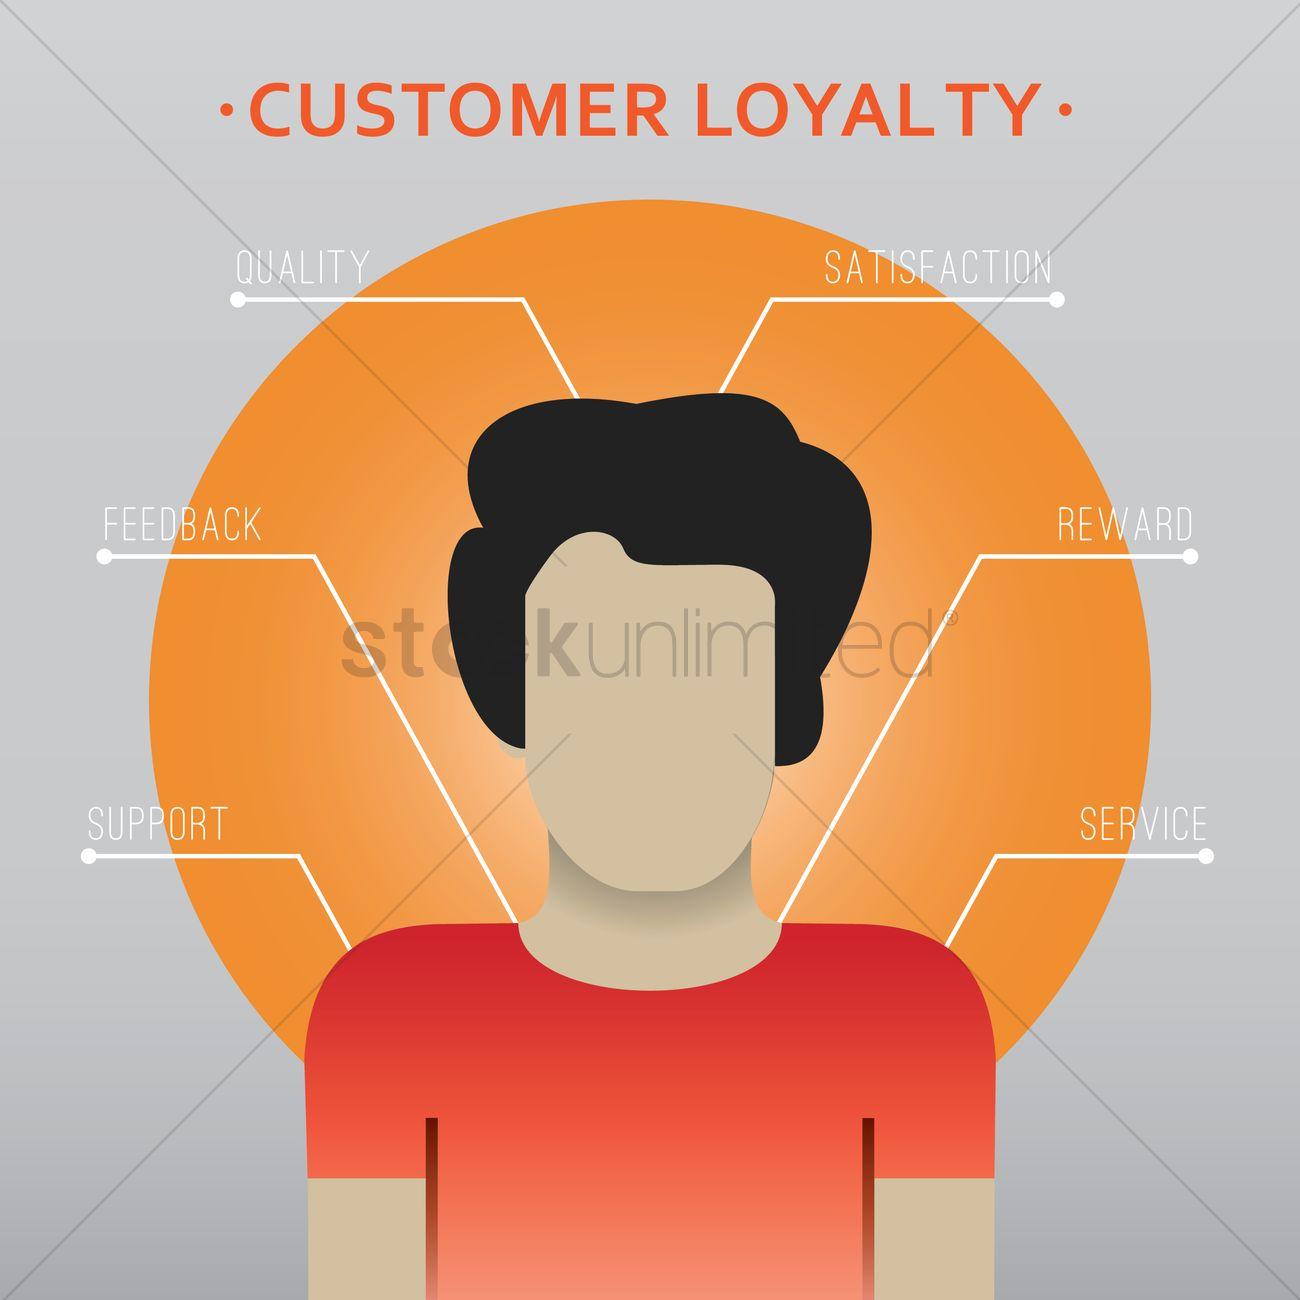 Customer loyalty Vector Image - 1953732 | StockUnlimited